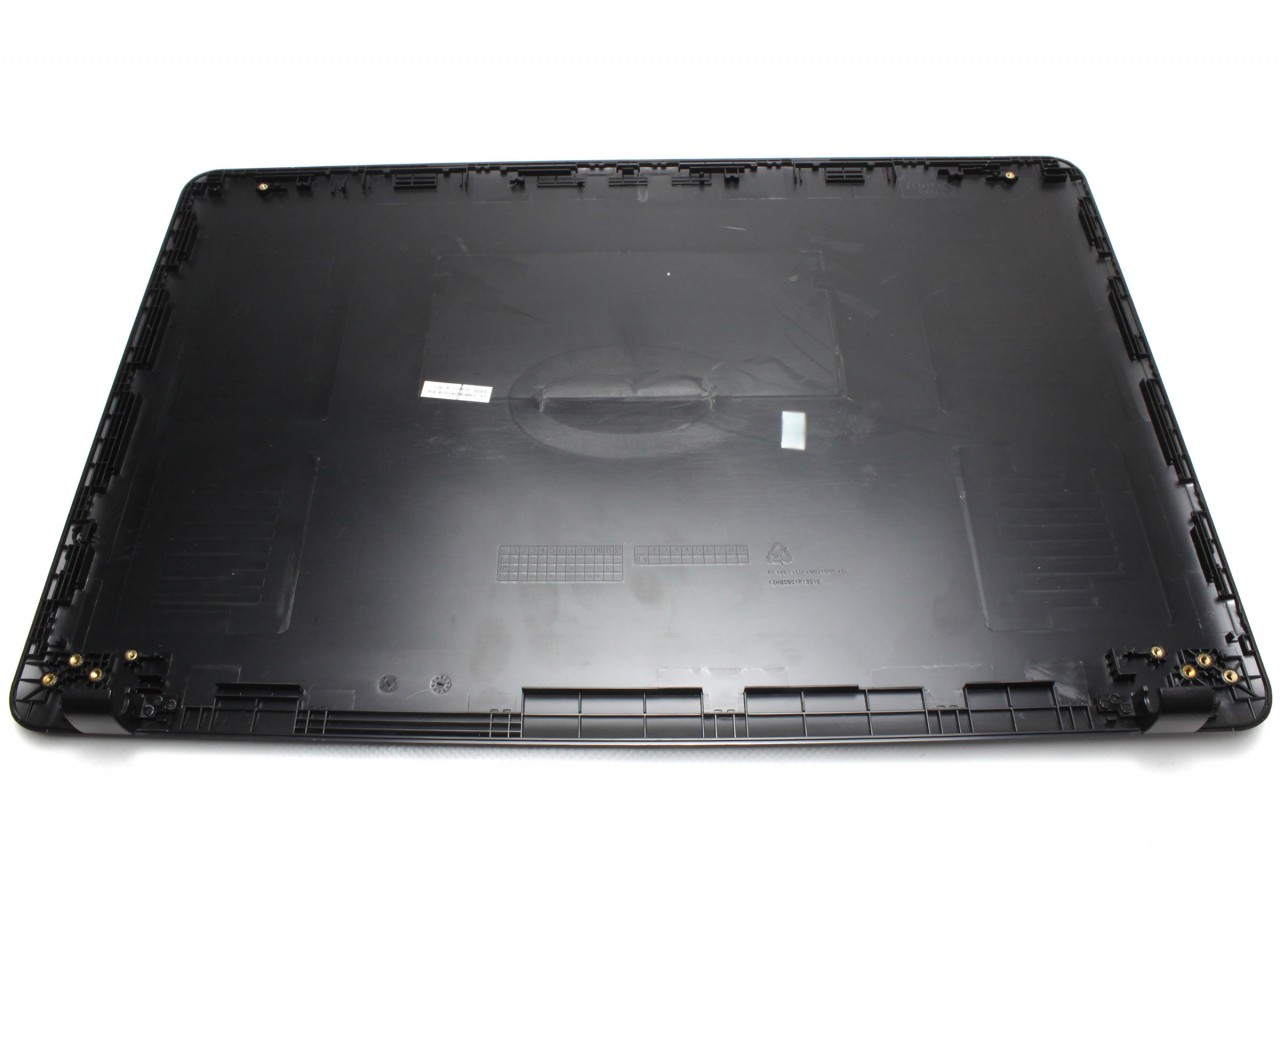 Capac Display BackCover Asus 90NB0B31 R7B010 Carcasa Display Neagra imagine